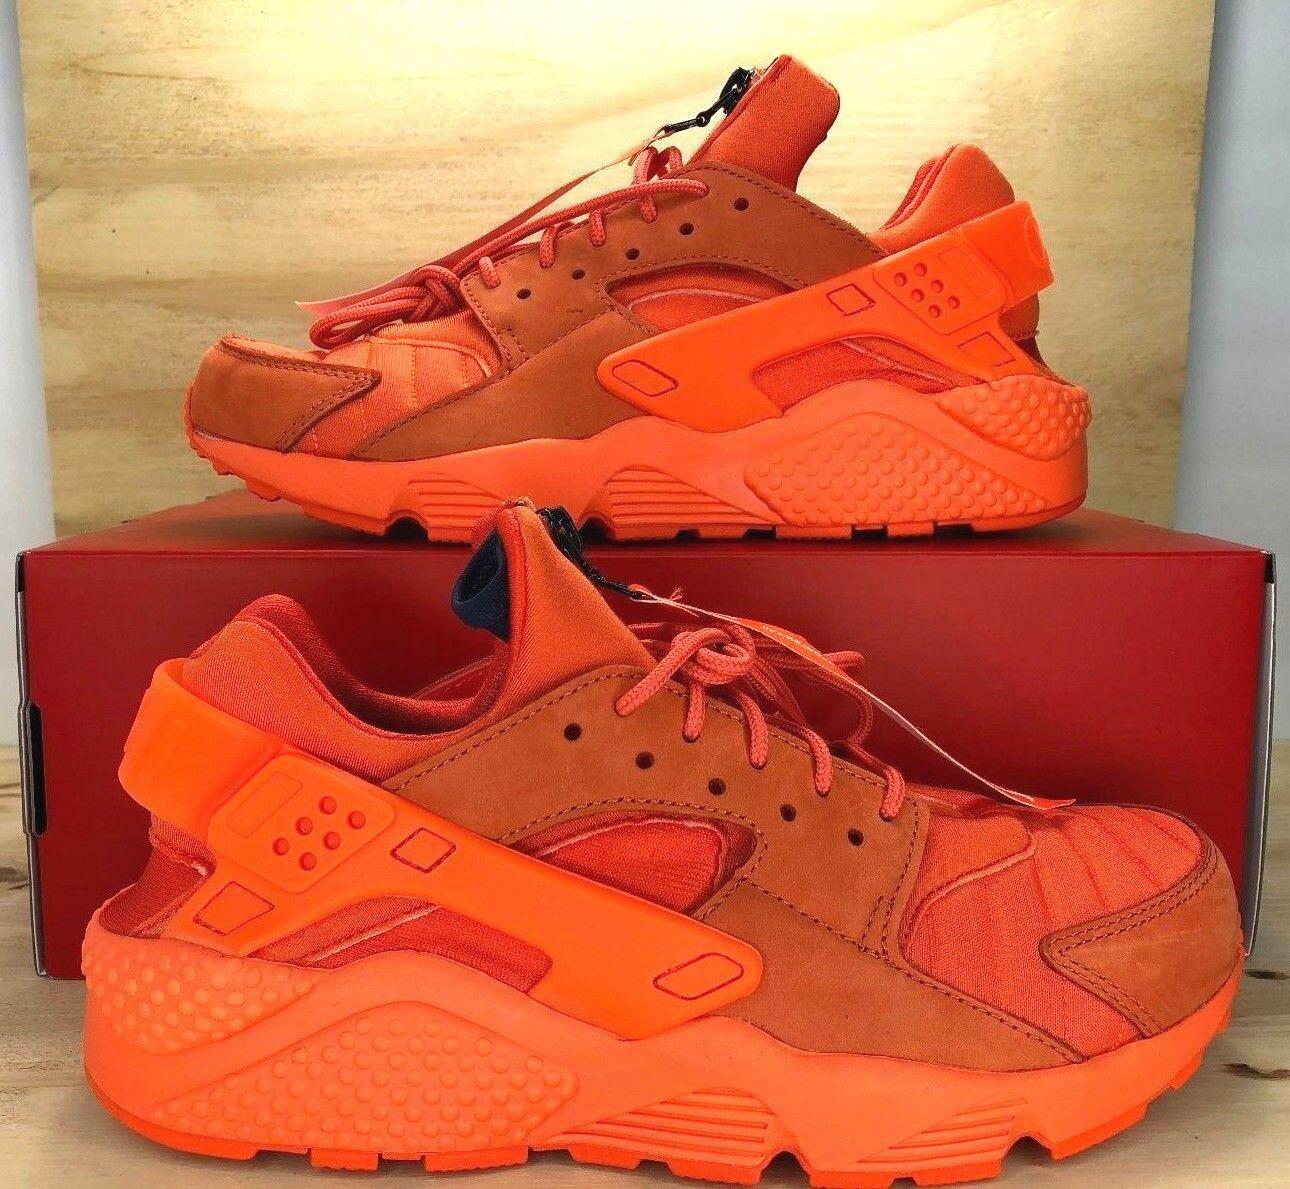 Nike air huarache qs chicago blaze scarpa arancione aj5578-800 scarpe da uomo sz